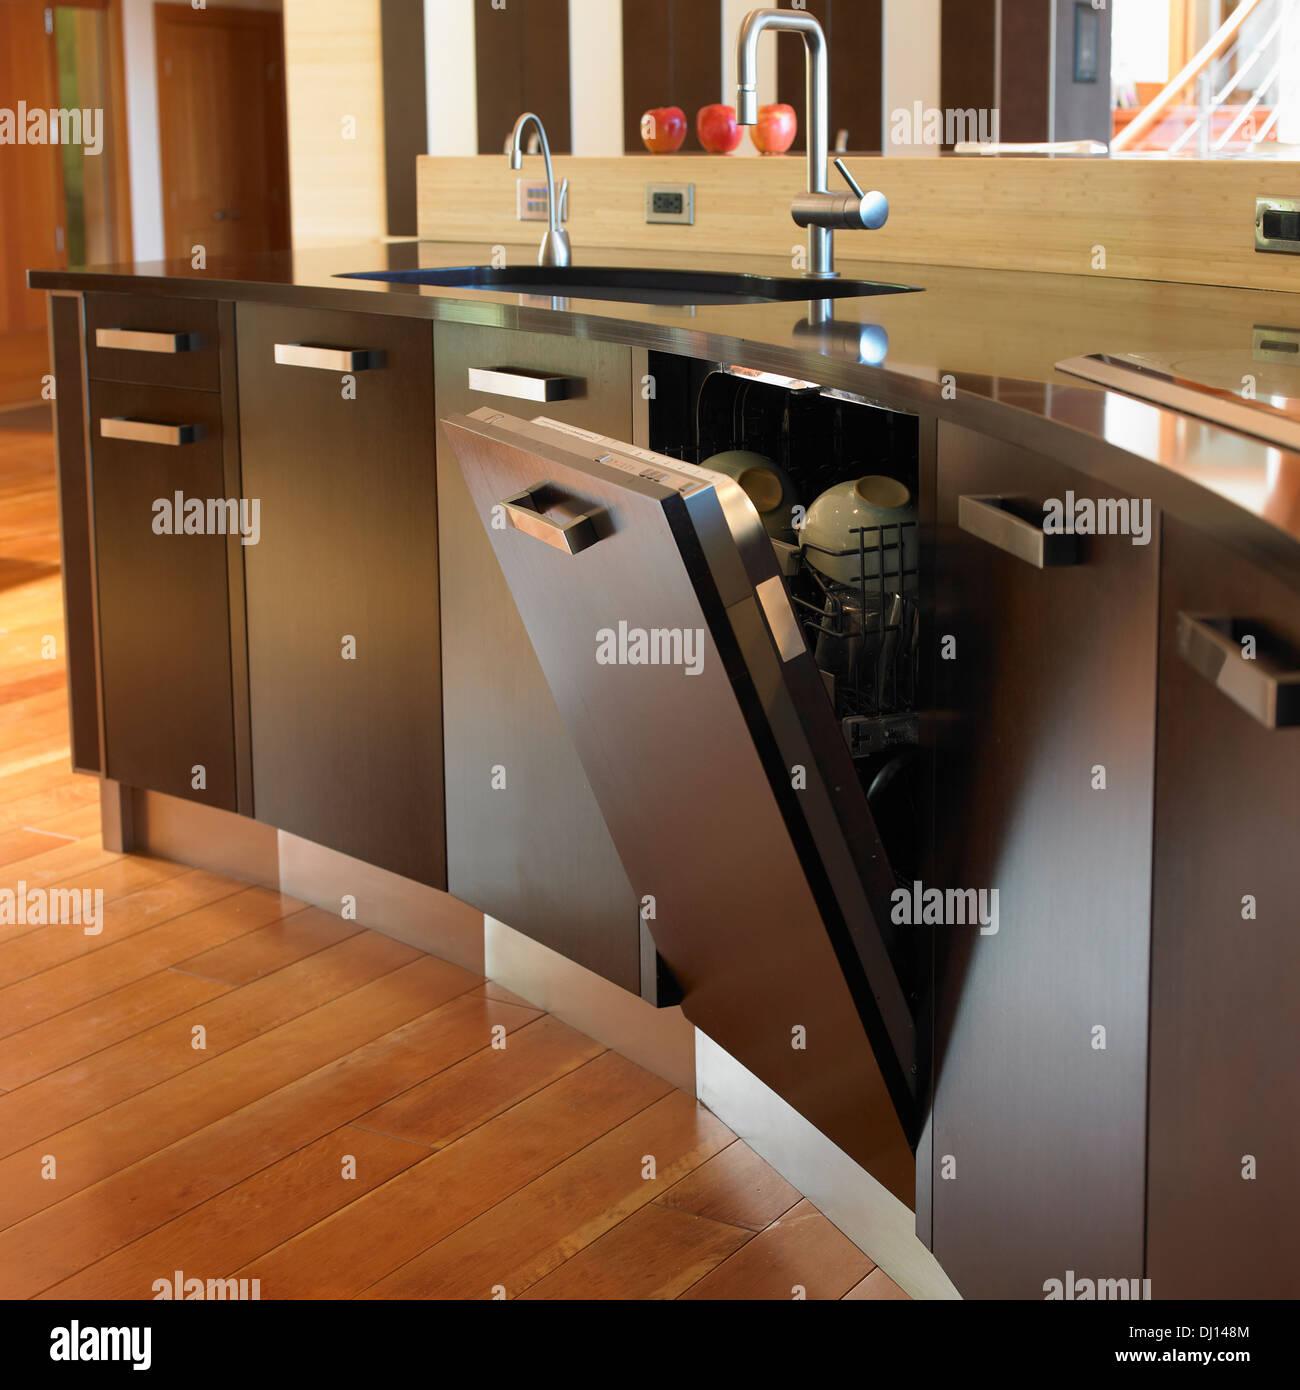 Kitchen Cabinet Doors Vancouver Bc: Built In Cabinet Stock Photos & Built In Cabinet Stock